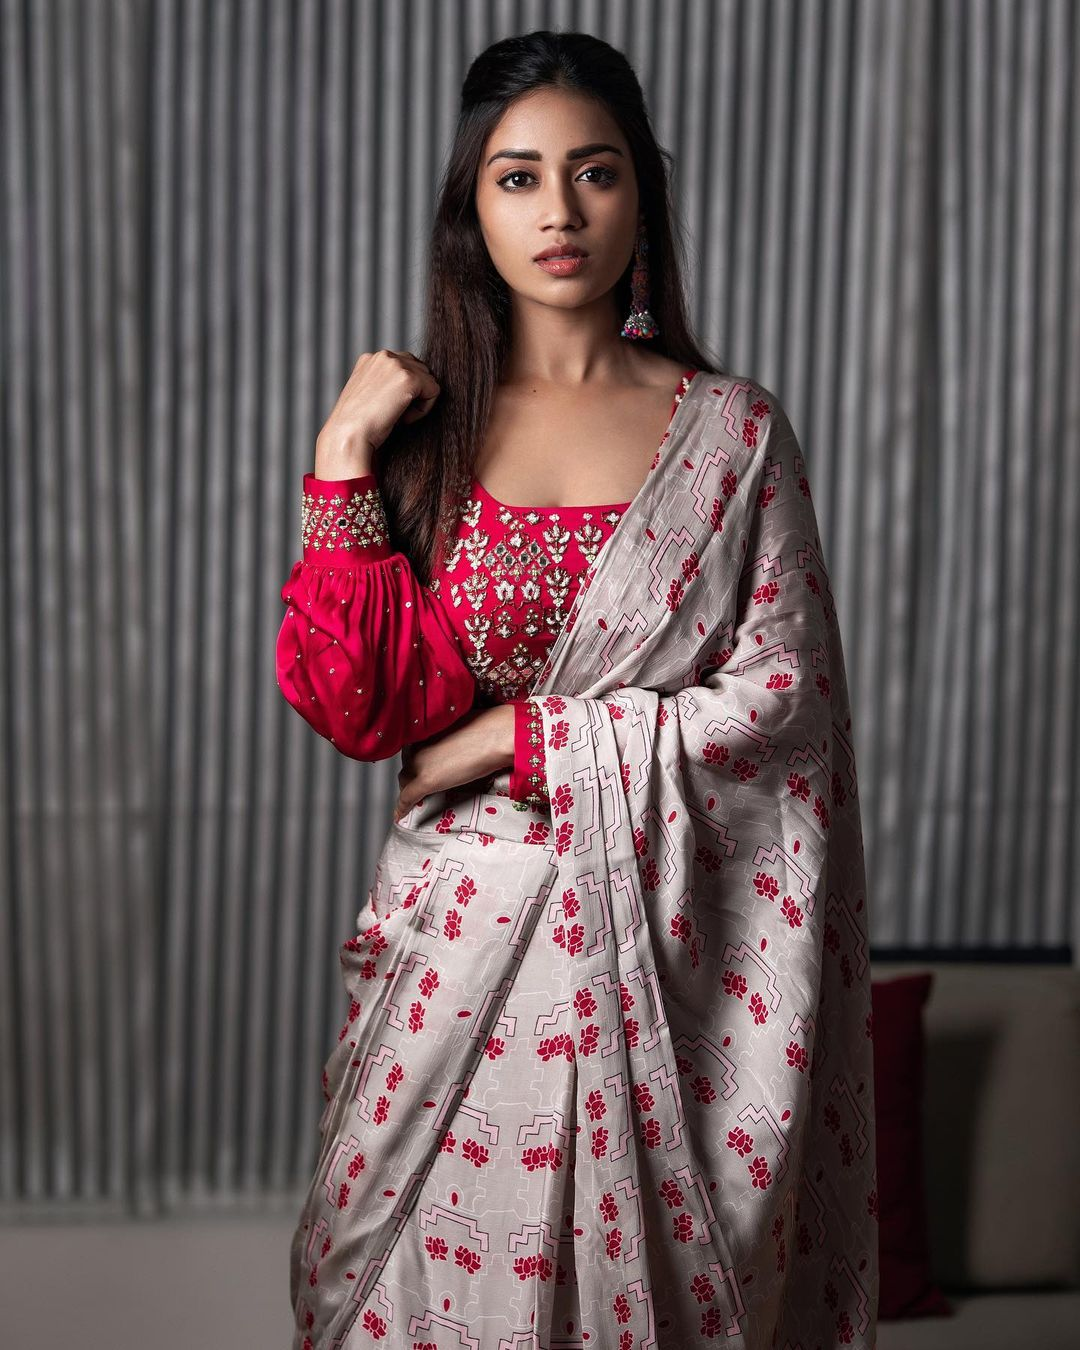 <br />நடிகை நிவேதா பெத்துராஜ் ( Image : Instagram @nivethapethuraj)